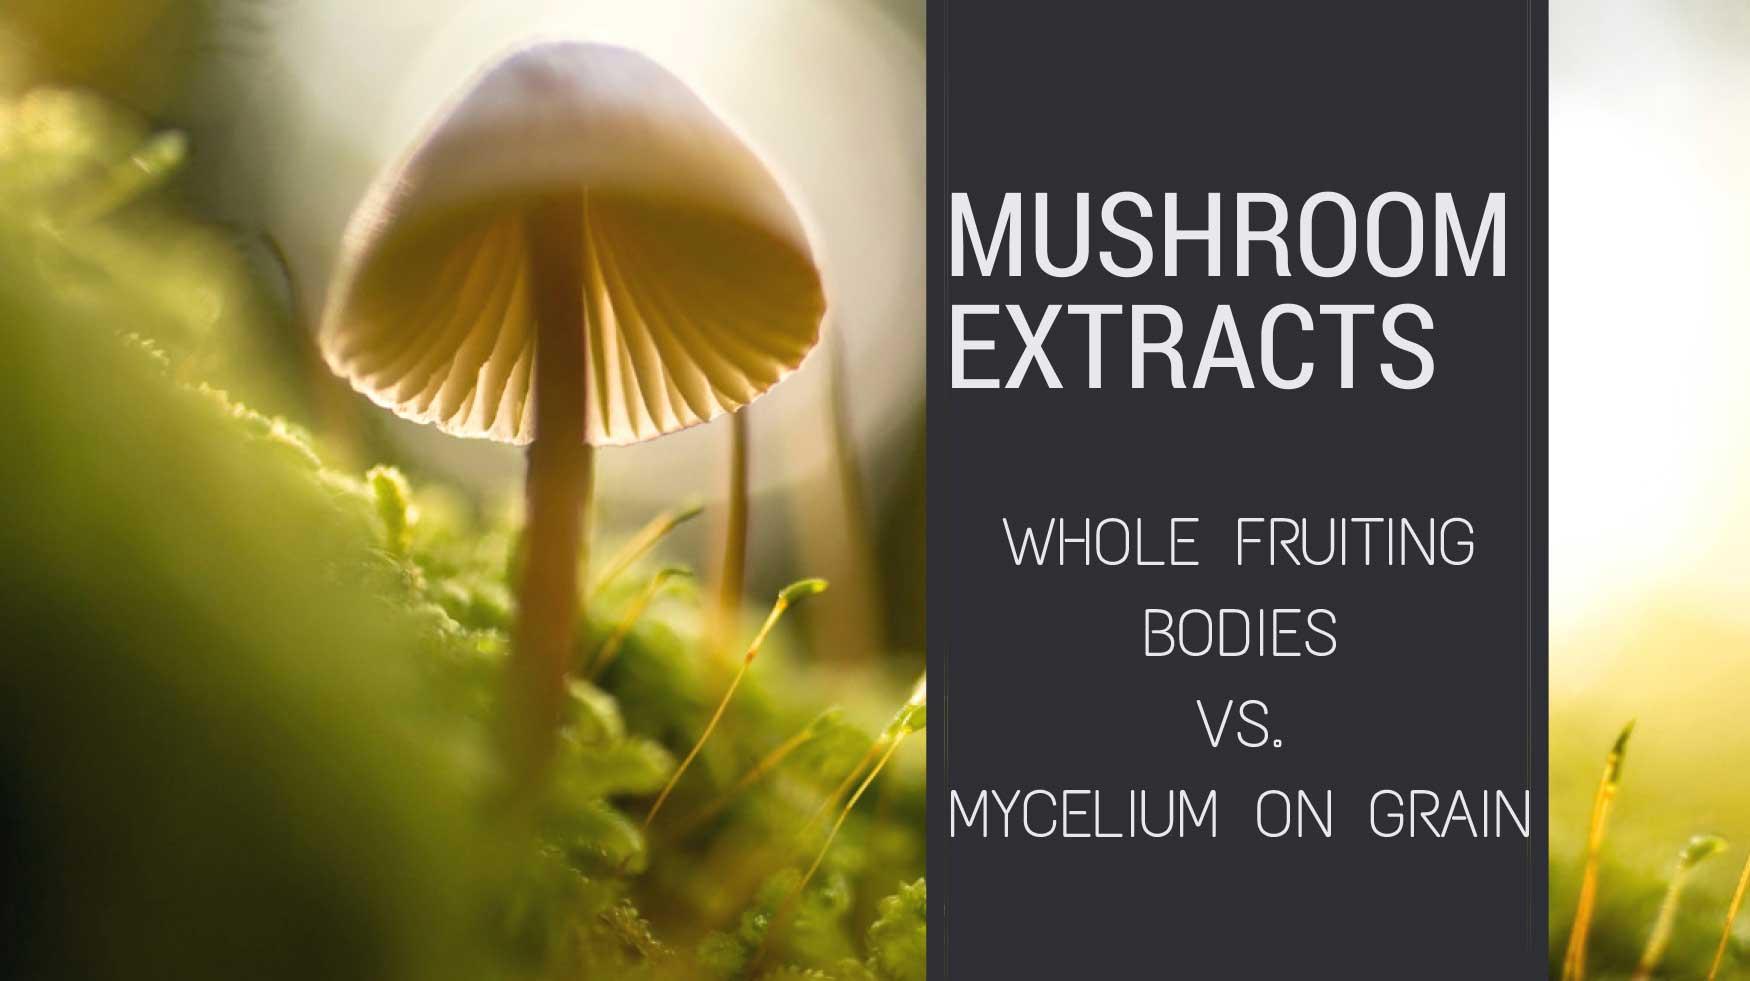 Mushroom Extracts: Whole Fruiting Bodies vs. Mycelium on Grain